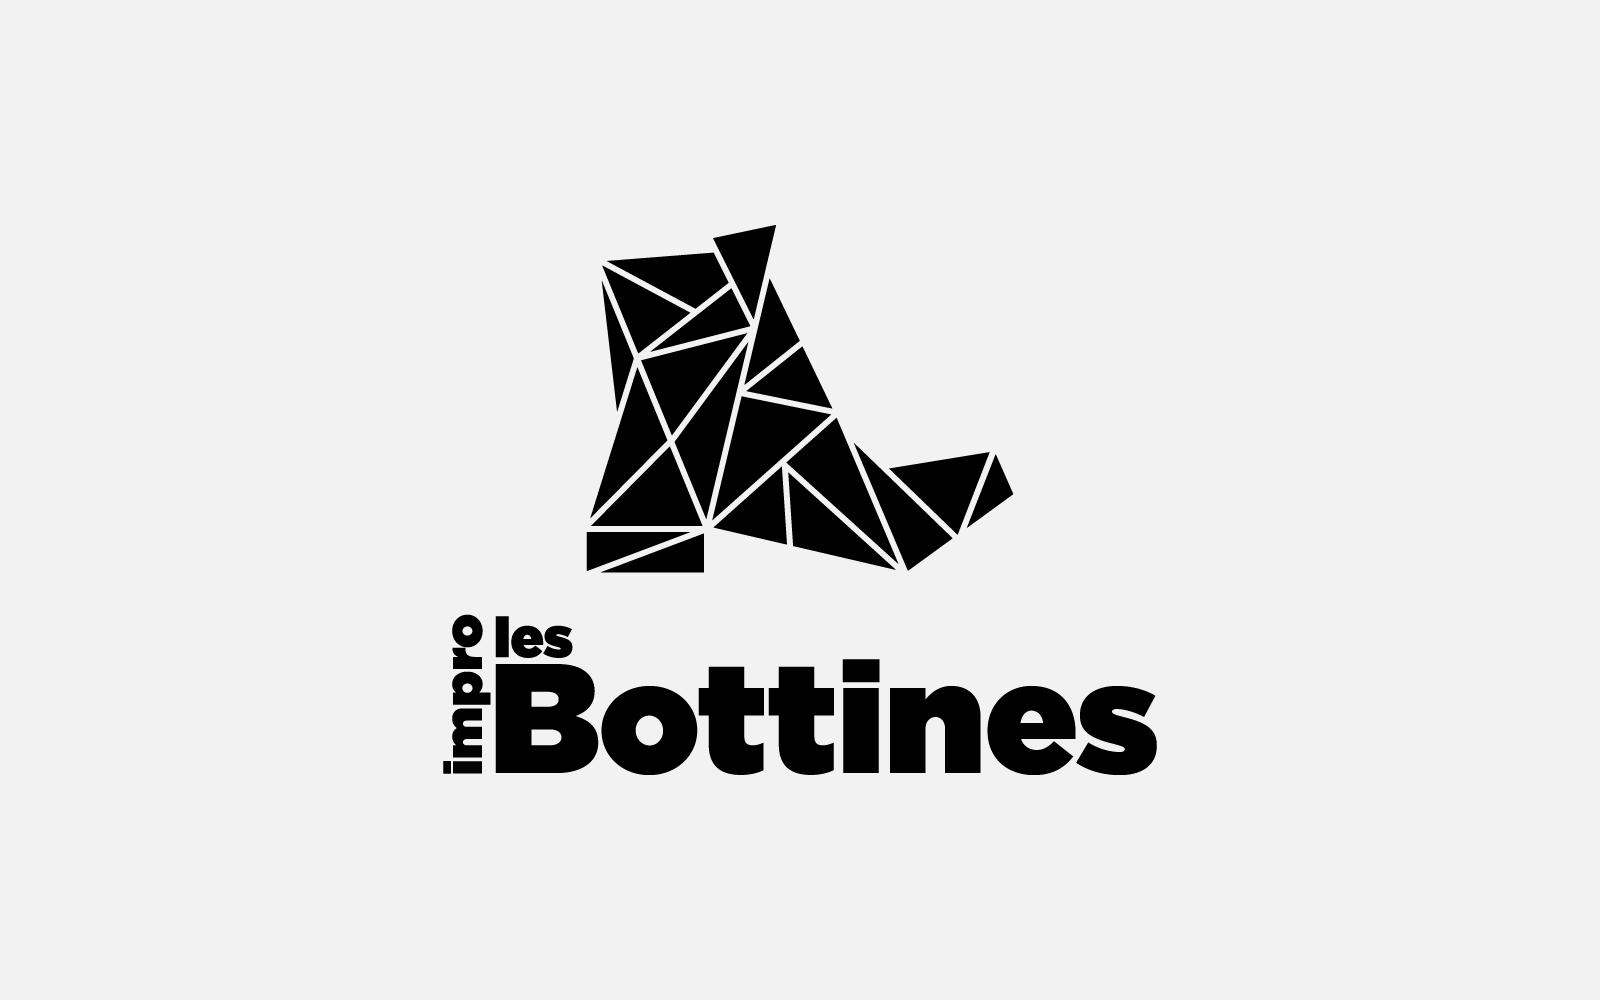 Les Bottines